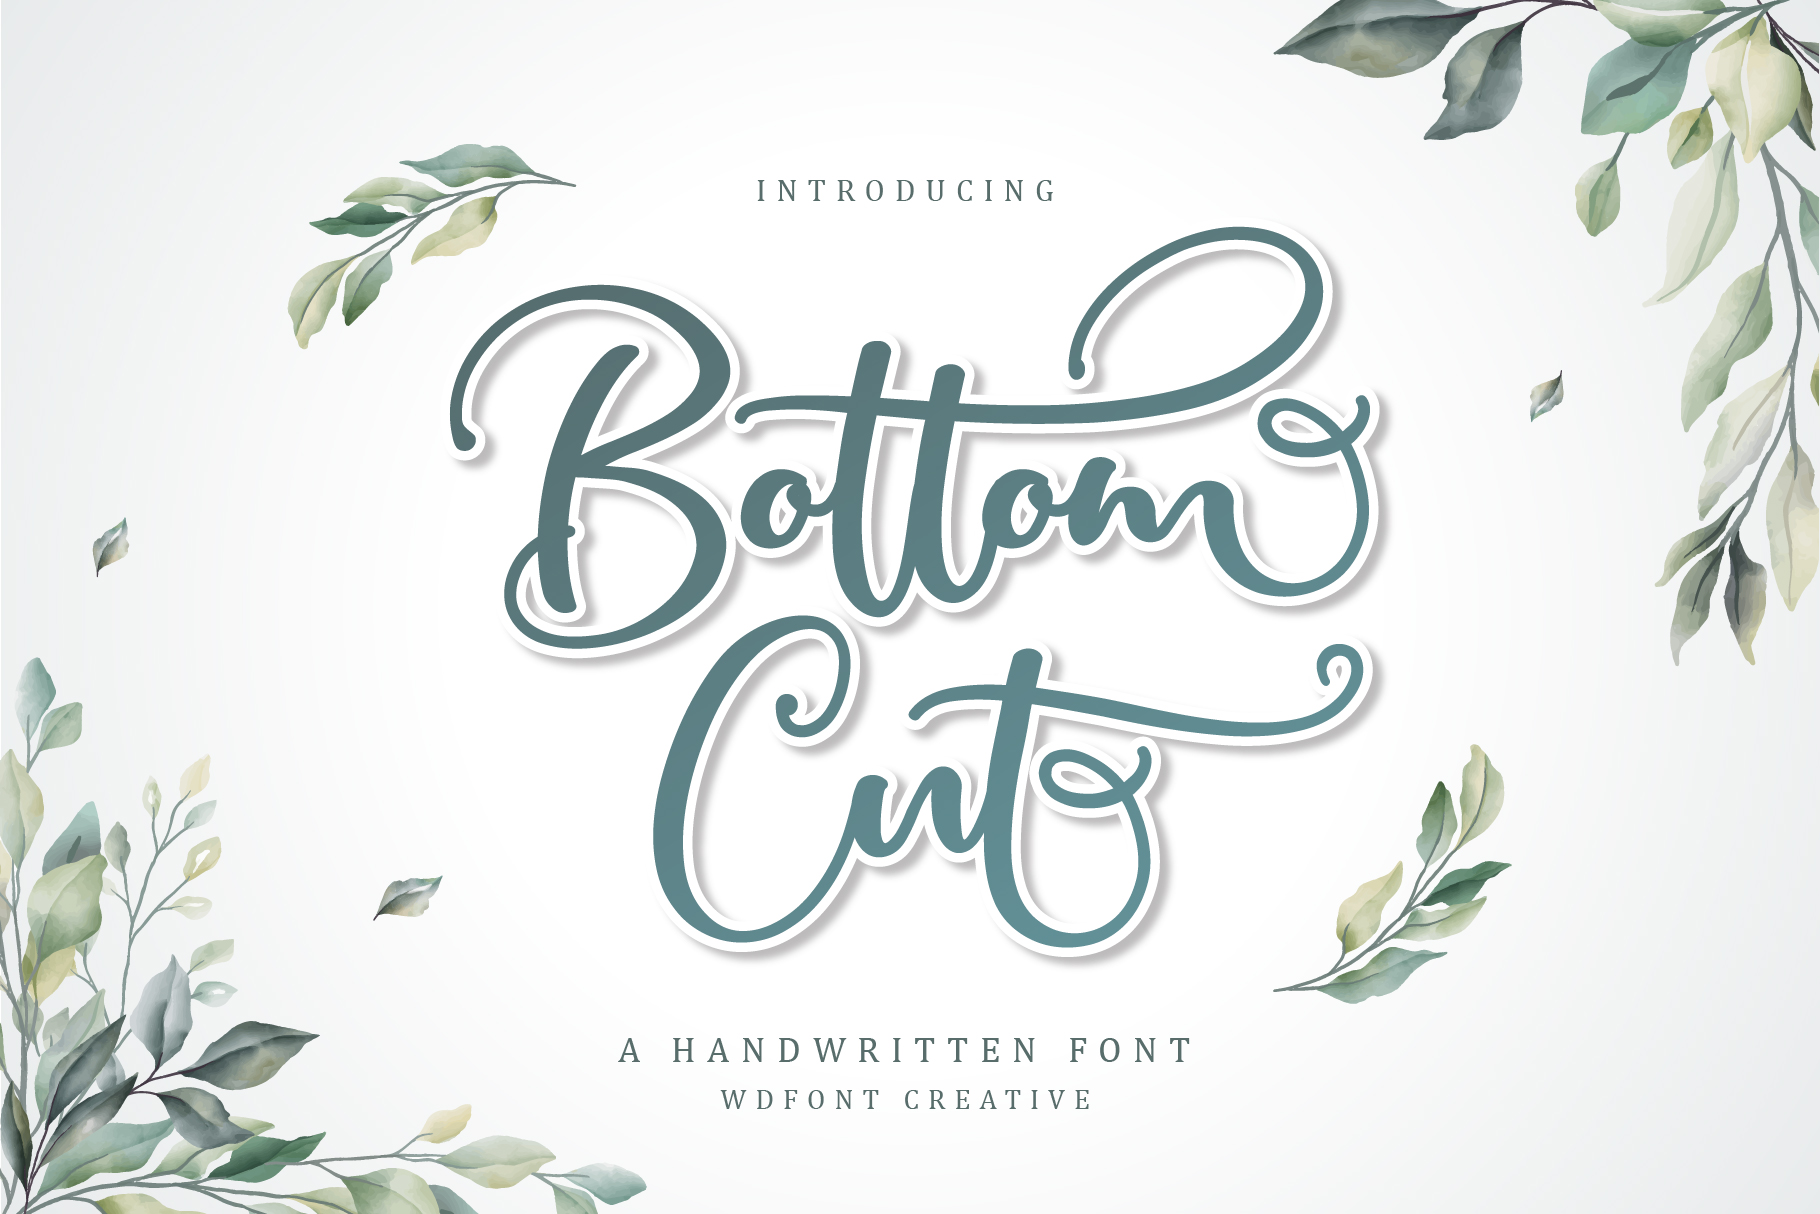 Bottom Cut Script | Modern Calligraphy example image 1